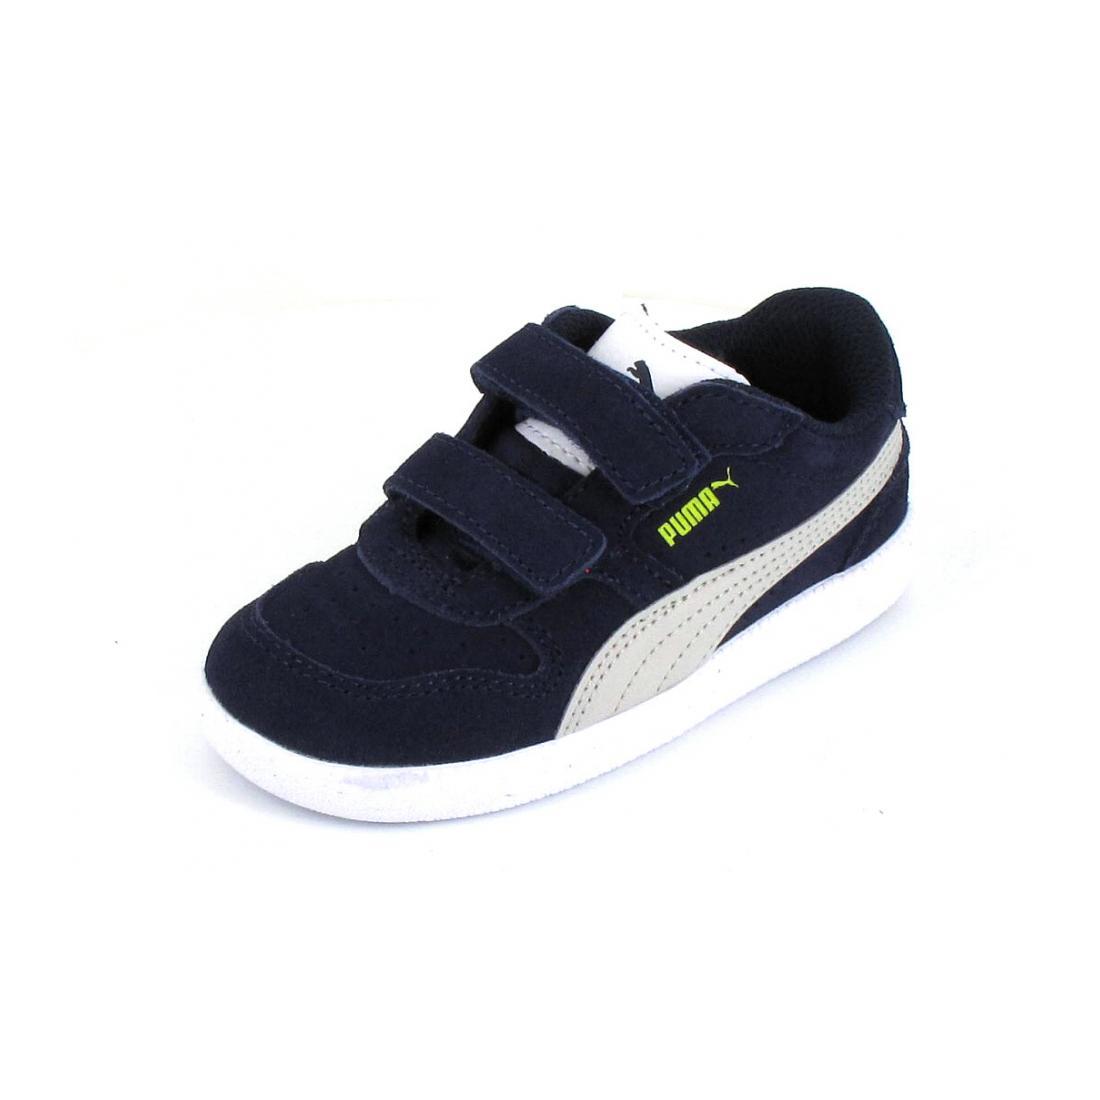 Puma Sneaker Icra Trainer SD V Inf